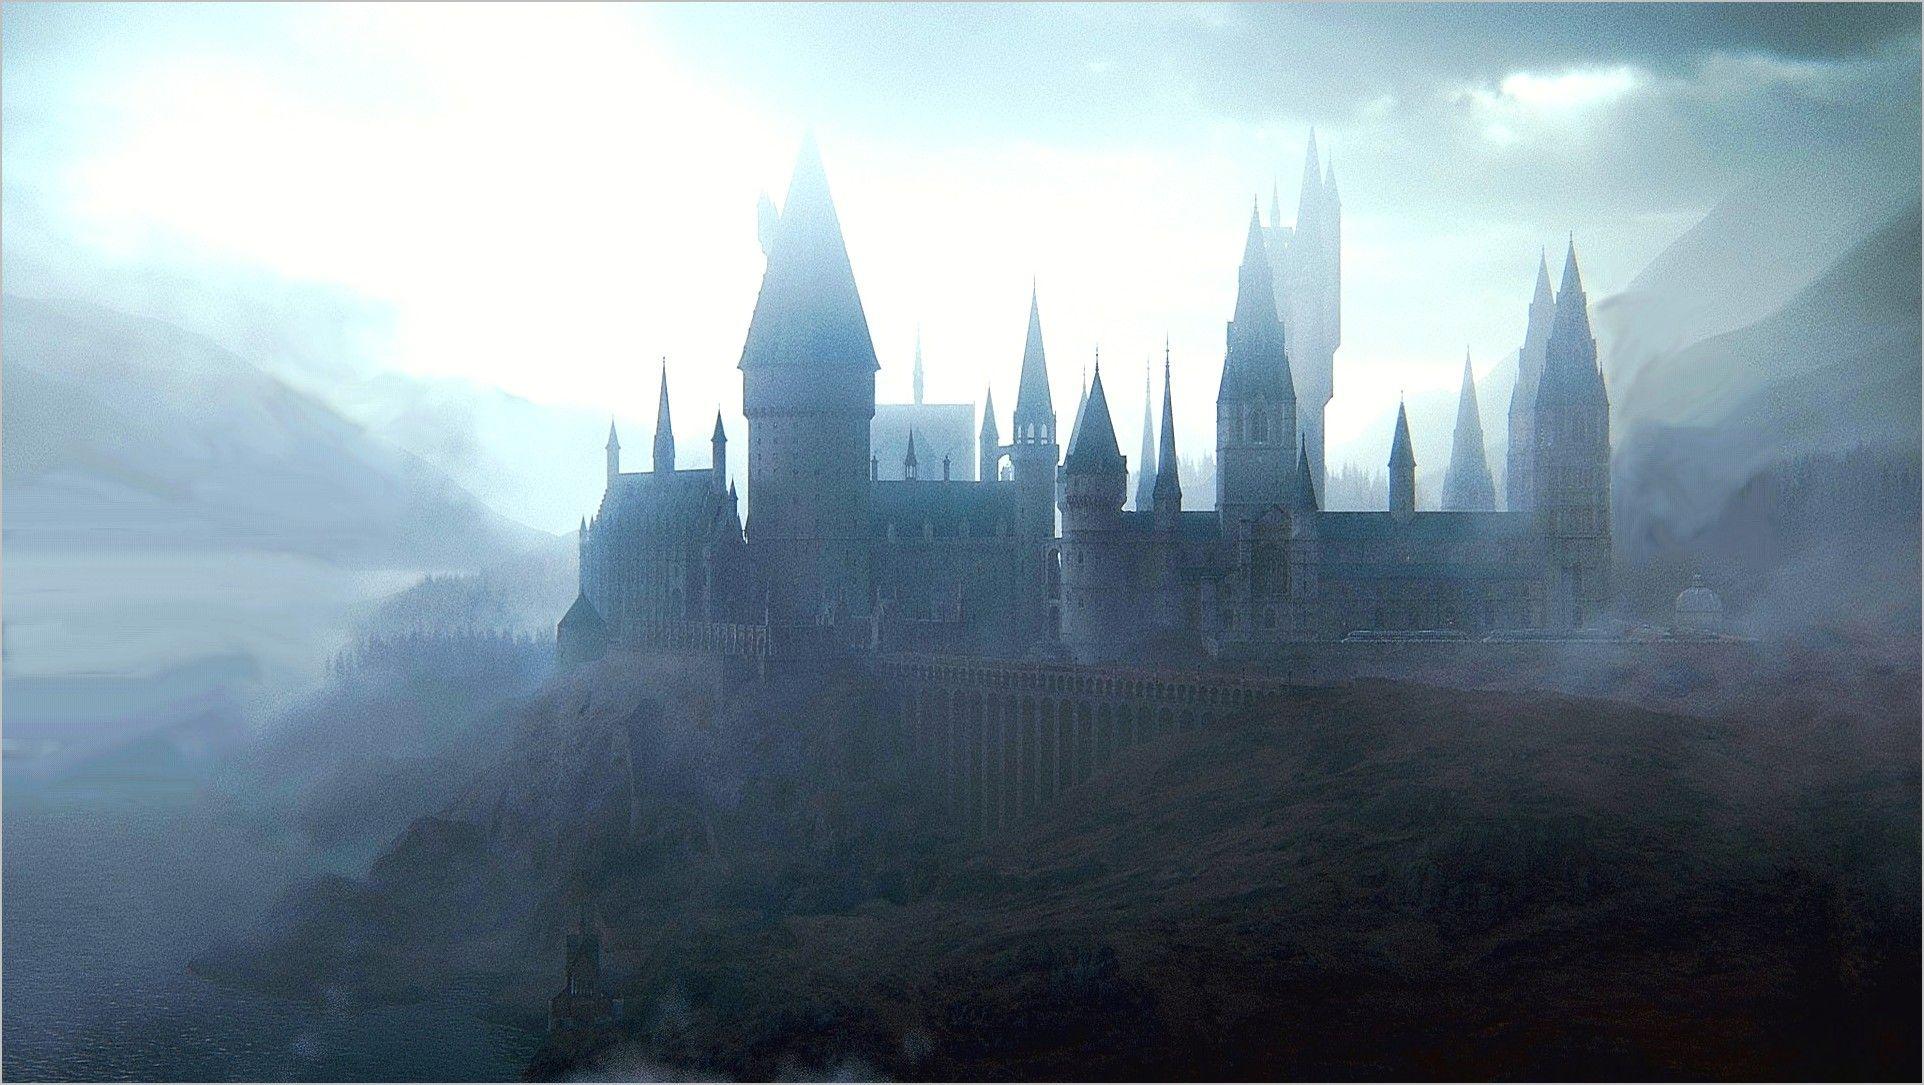 Hogwarts 4k Mac Wallpaper In 2020 Harry Potter Wallpaper Harry Potter Wallpaper Backgrounds Desktop Wallpaper Harry Potter